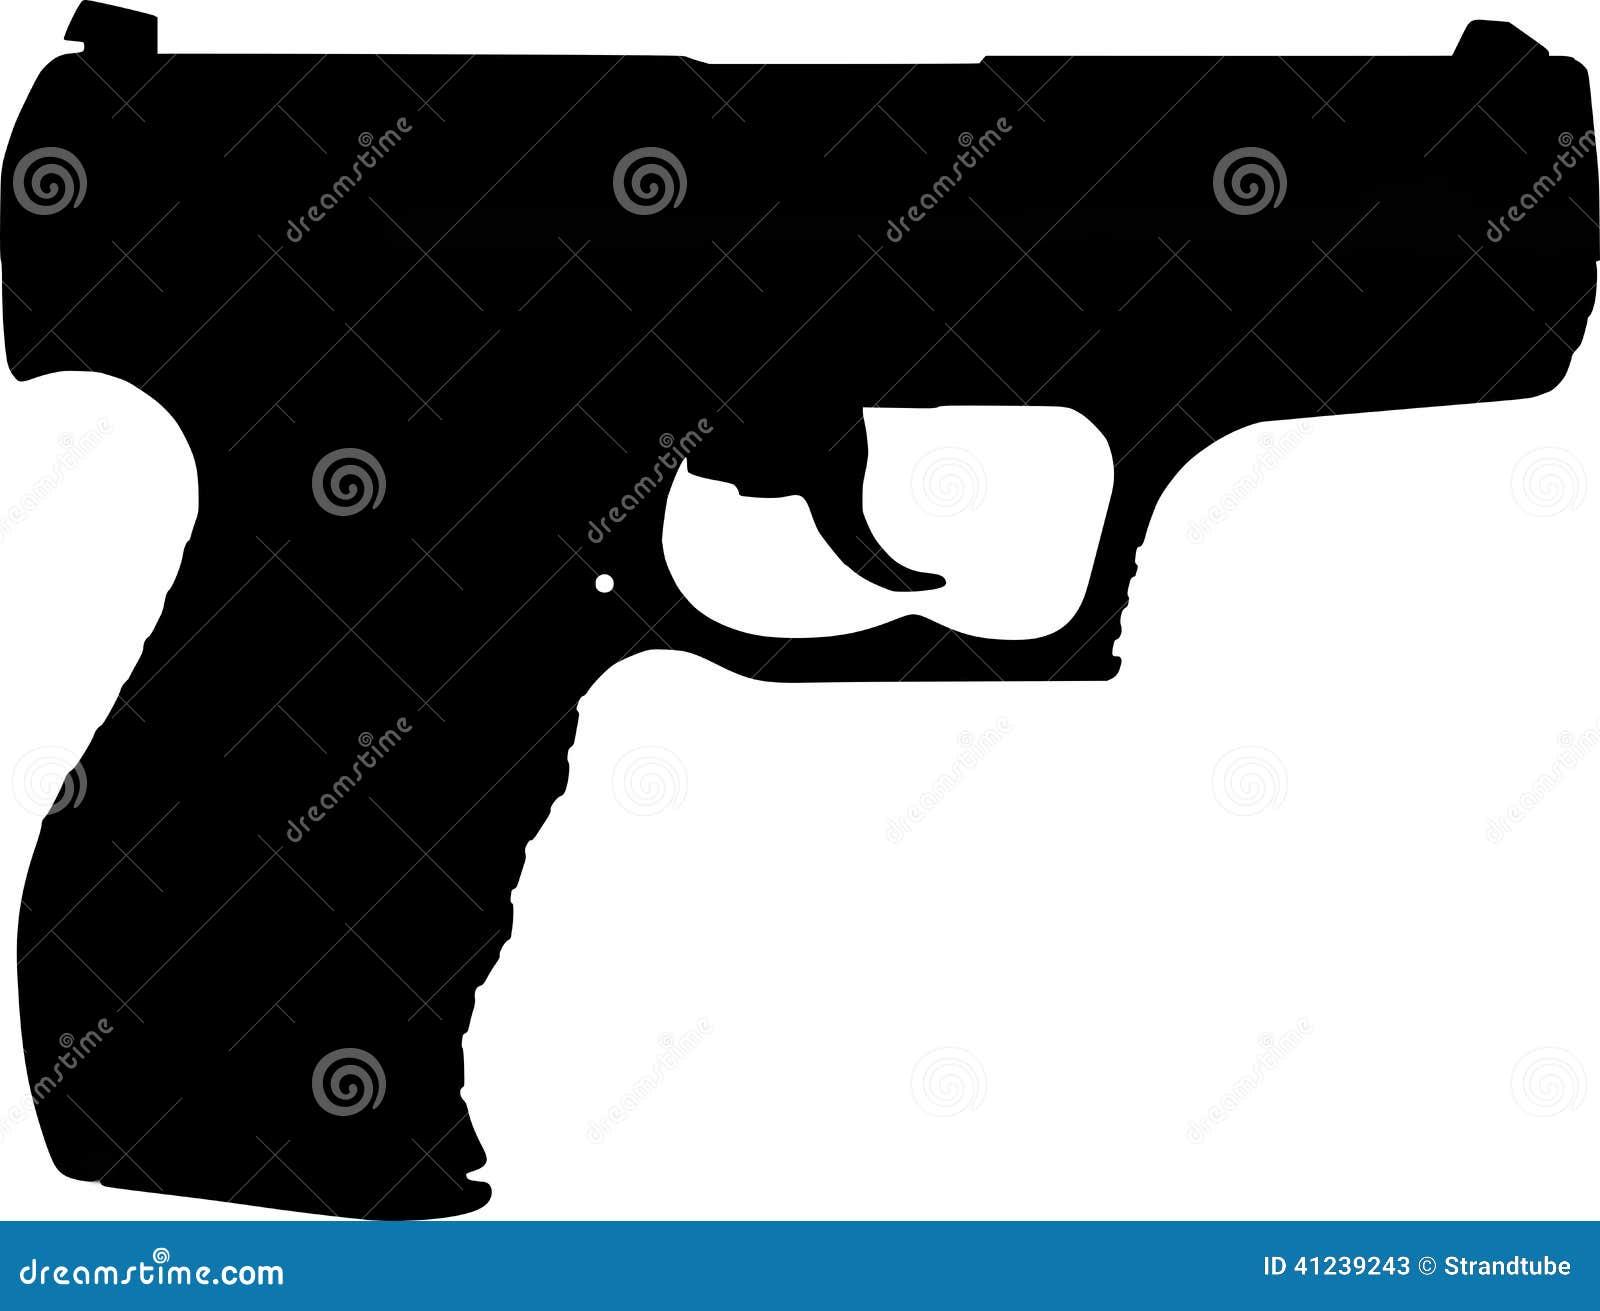 Line Art Gun : Stock photos gun silhouette image